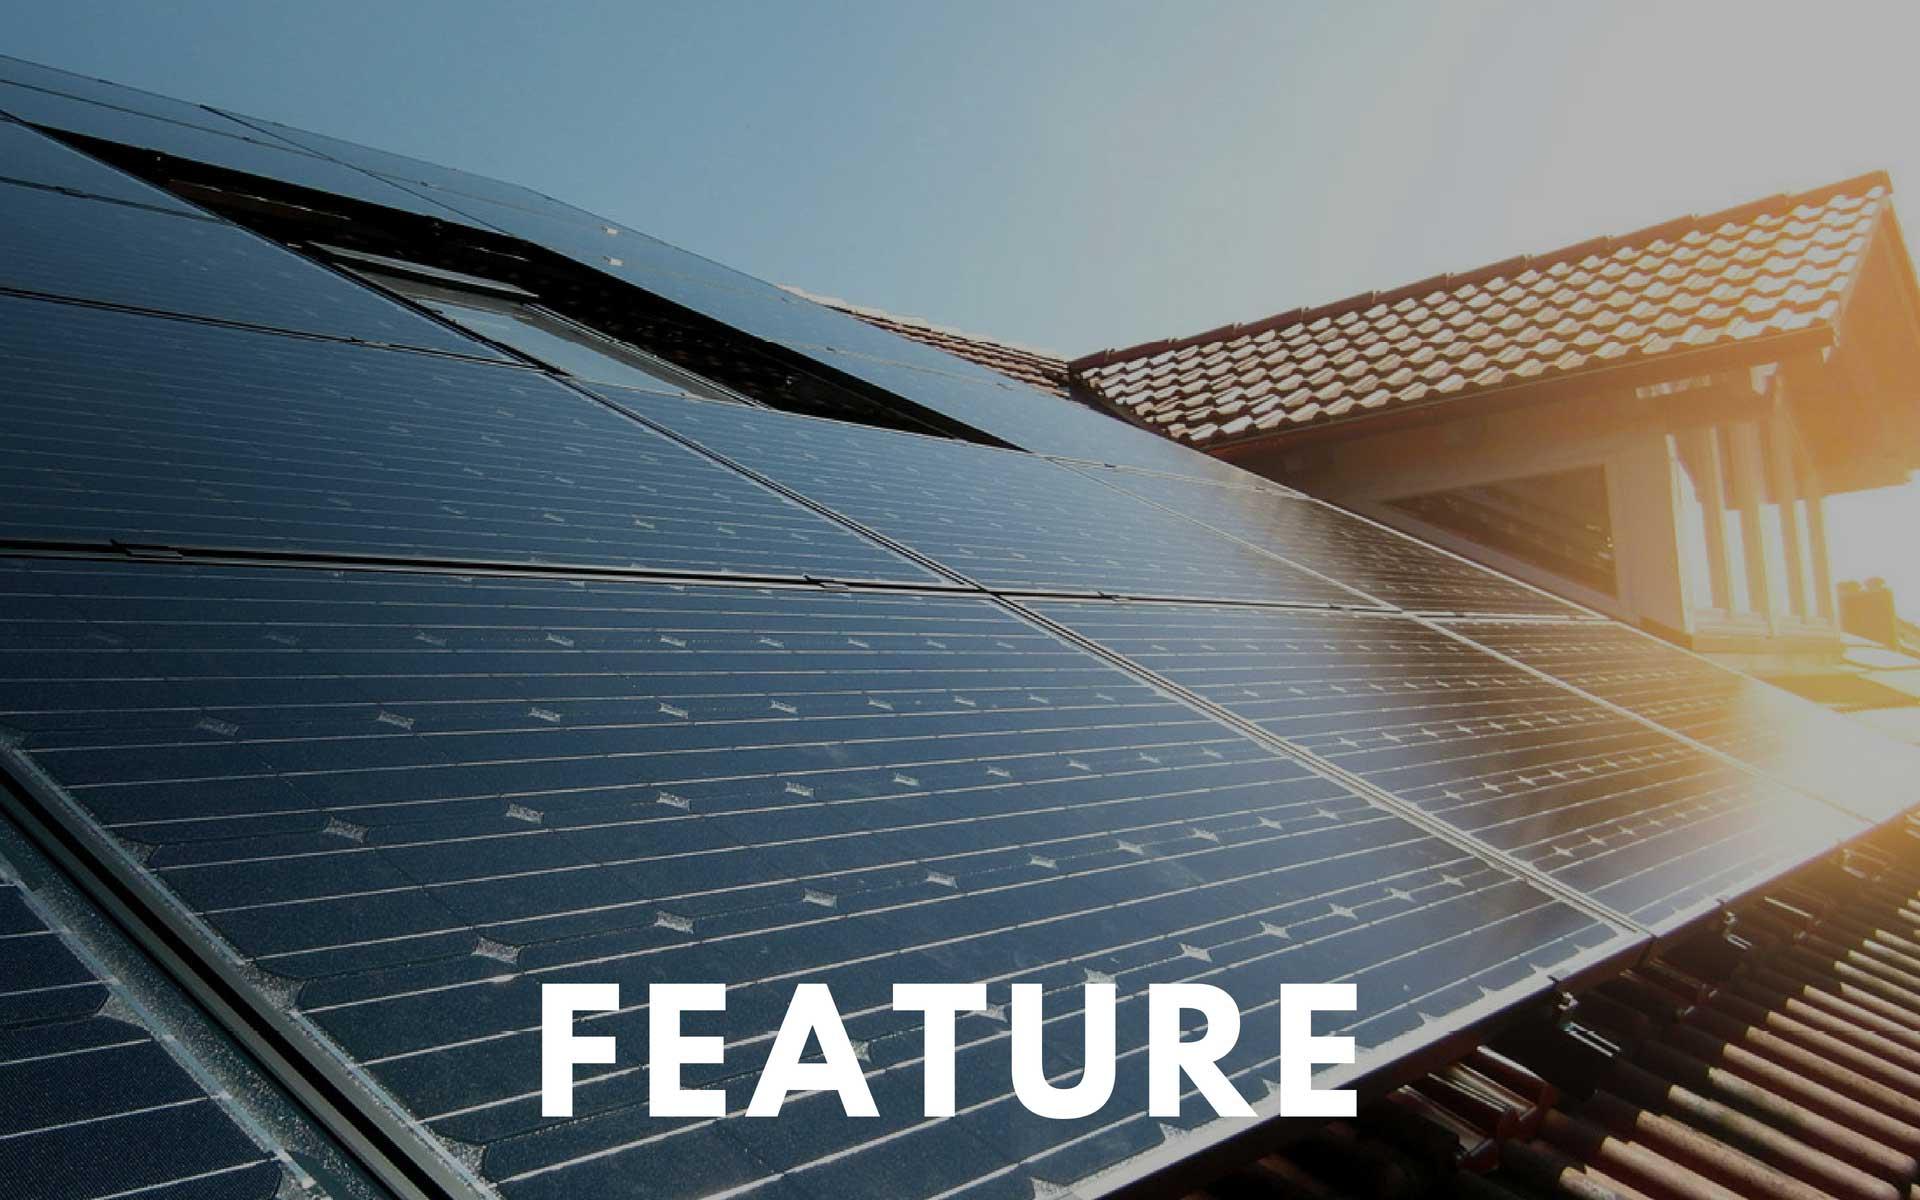 21 Reasons to Choose SolarWatt Solar Modules by PSW Energy (Perth Solar Warehouse)